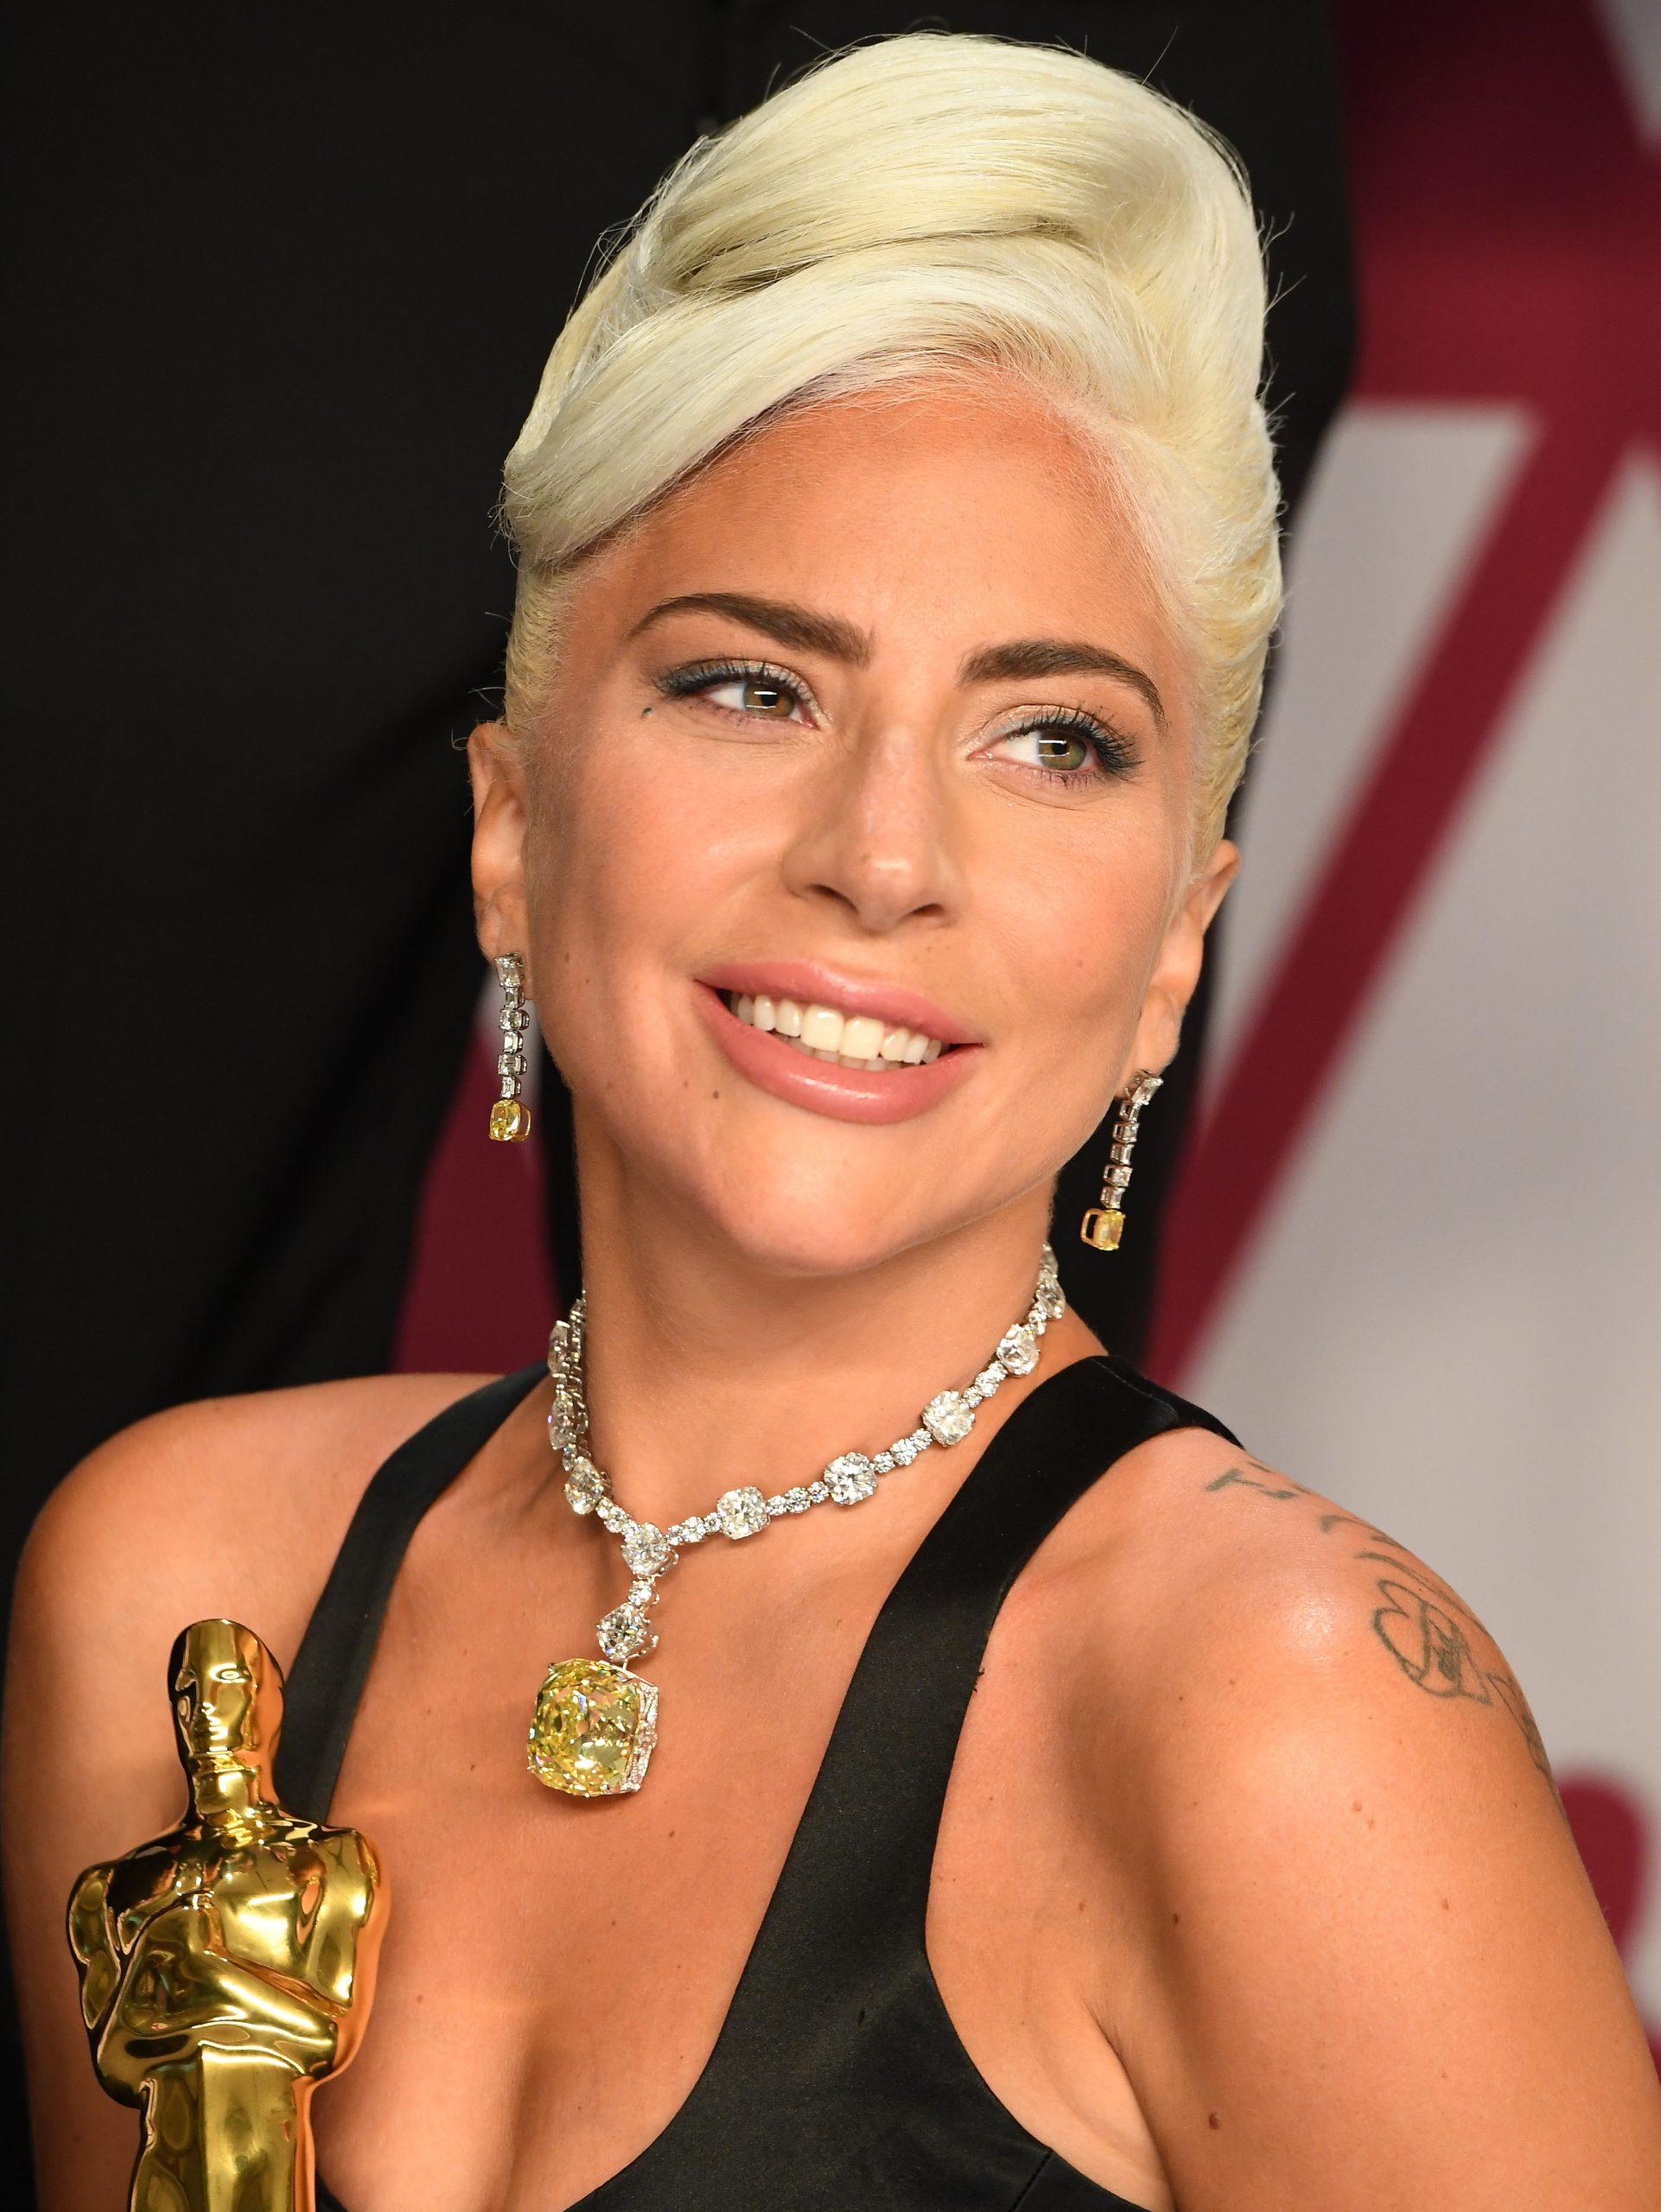 Lady Gaga at the 2019 Academy Awards wearing the Tiffany Diamond necklace